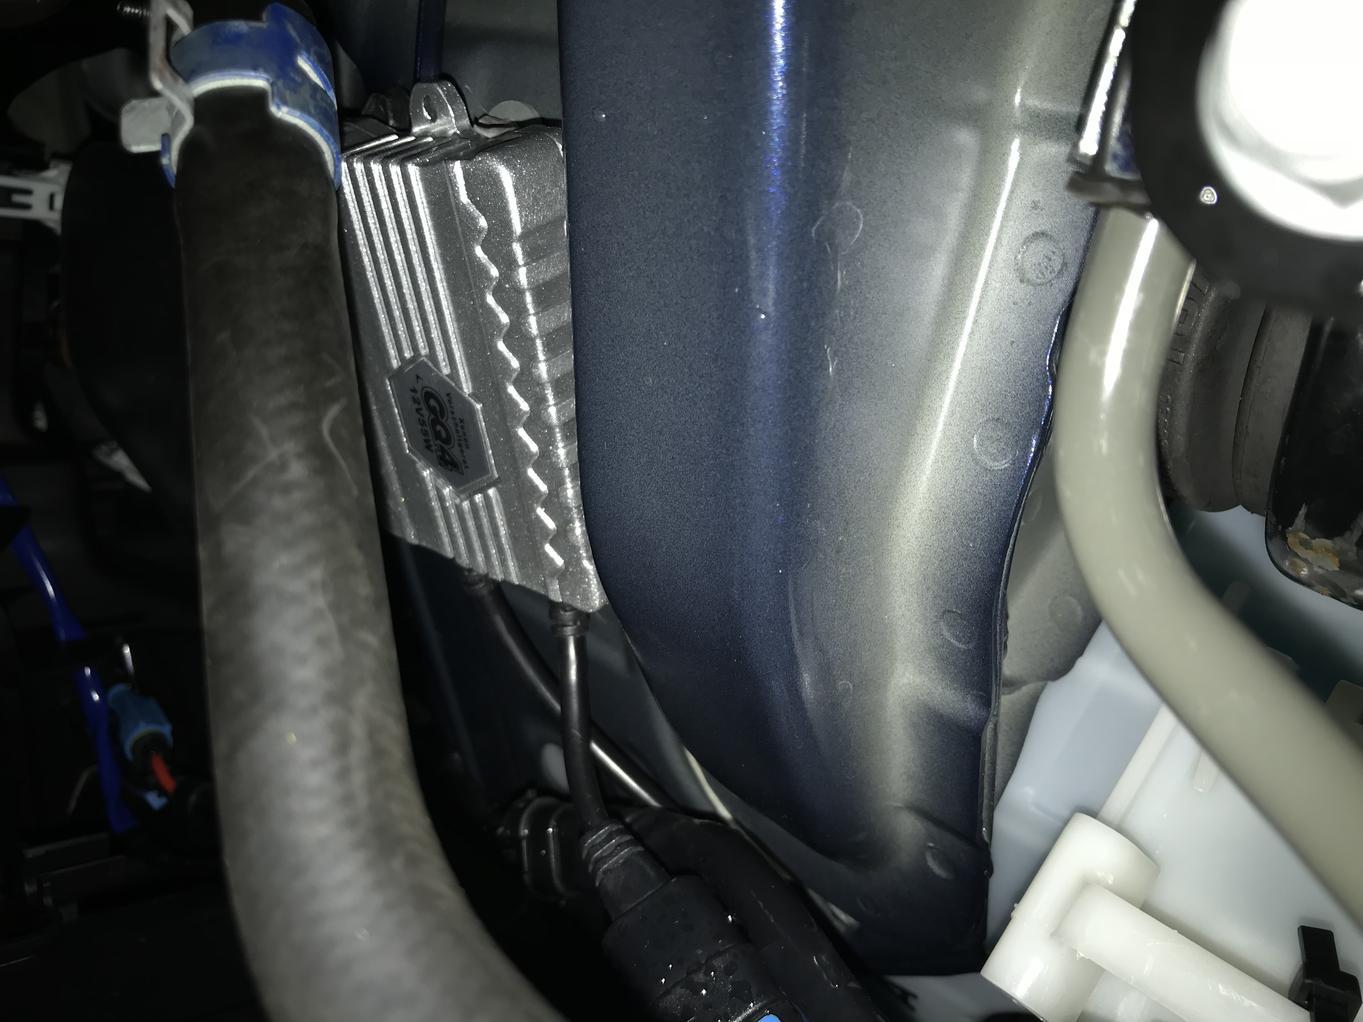 My Tucked HID install thread-89ce1789-7569-4ce6-ad97-51042f0e4bb7-jpg